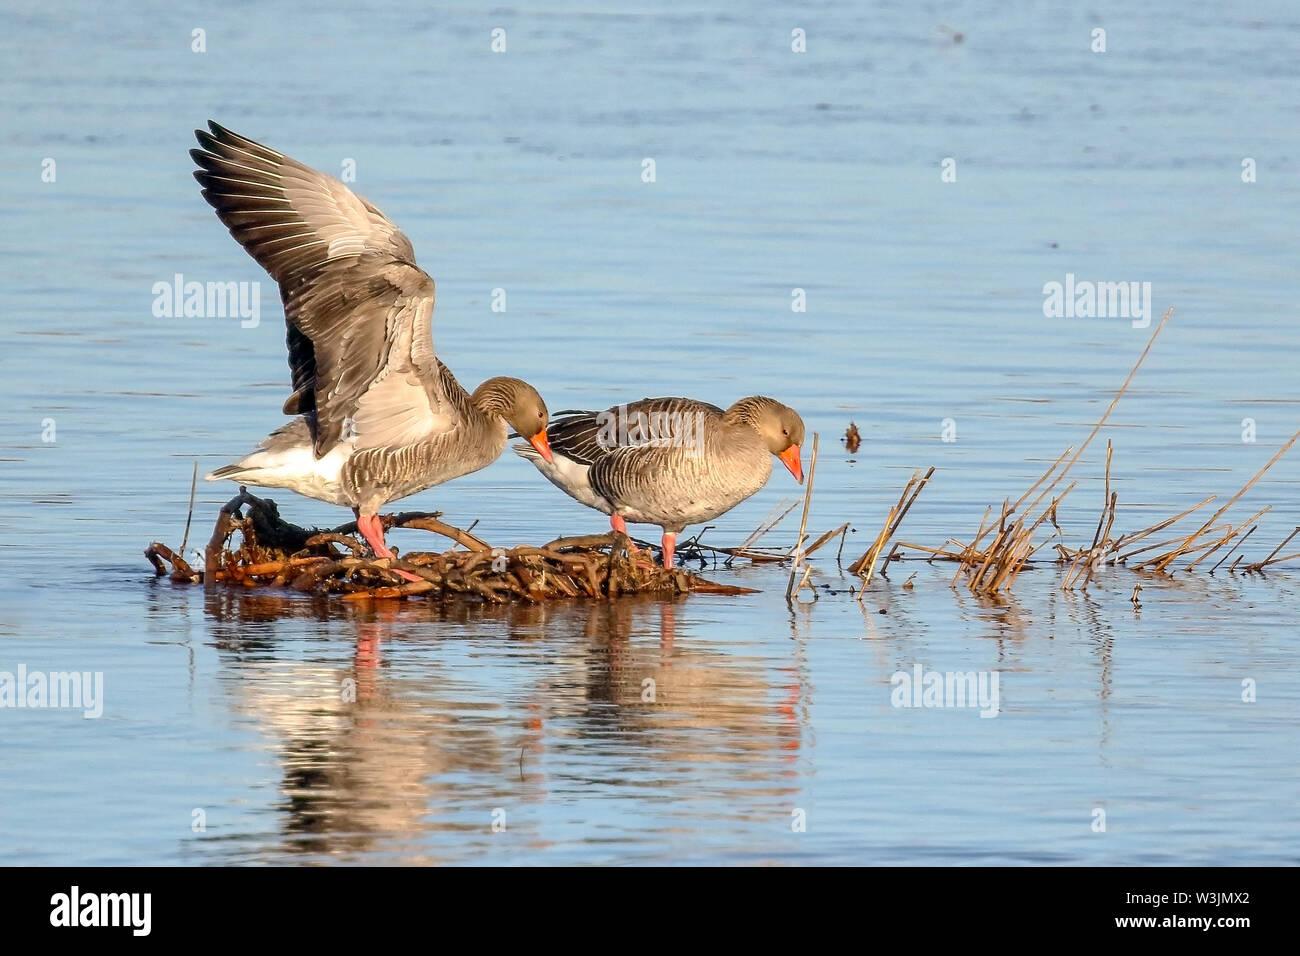 Greylag goose  in spring - Stock Image